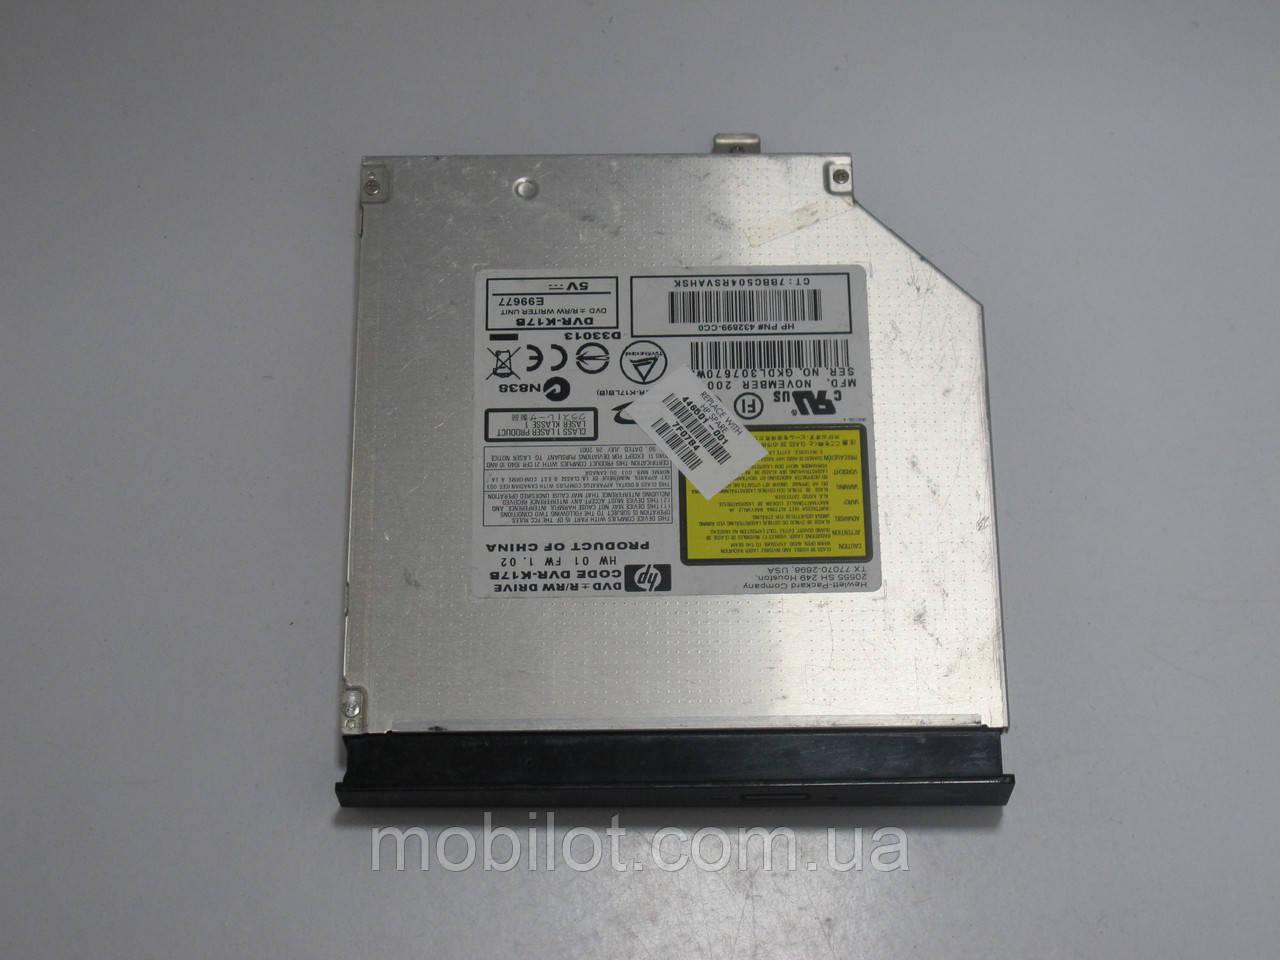 Оптический привод HP DV6000 (NZ-5062)